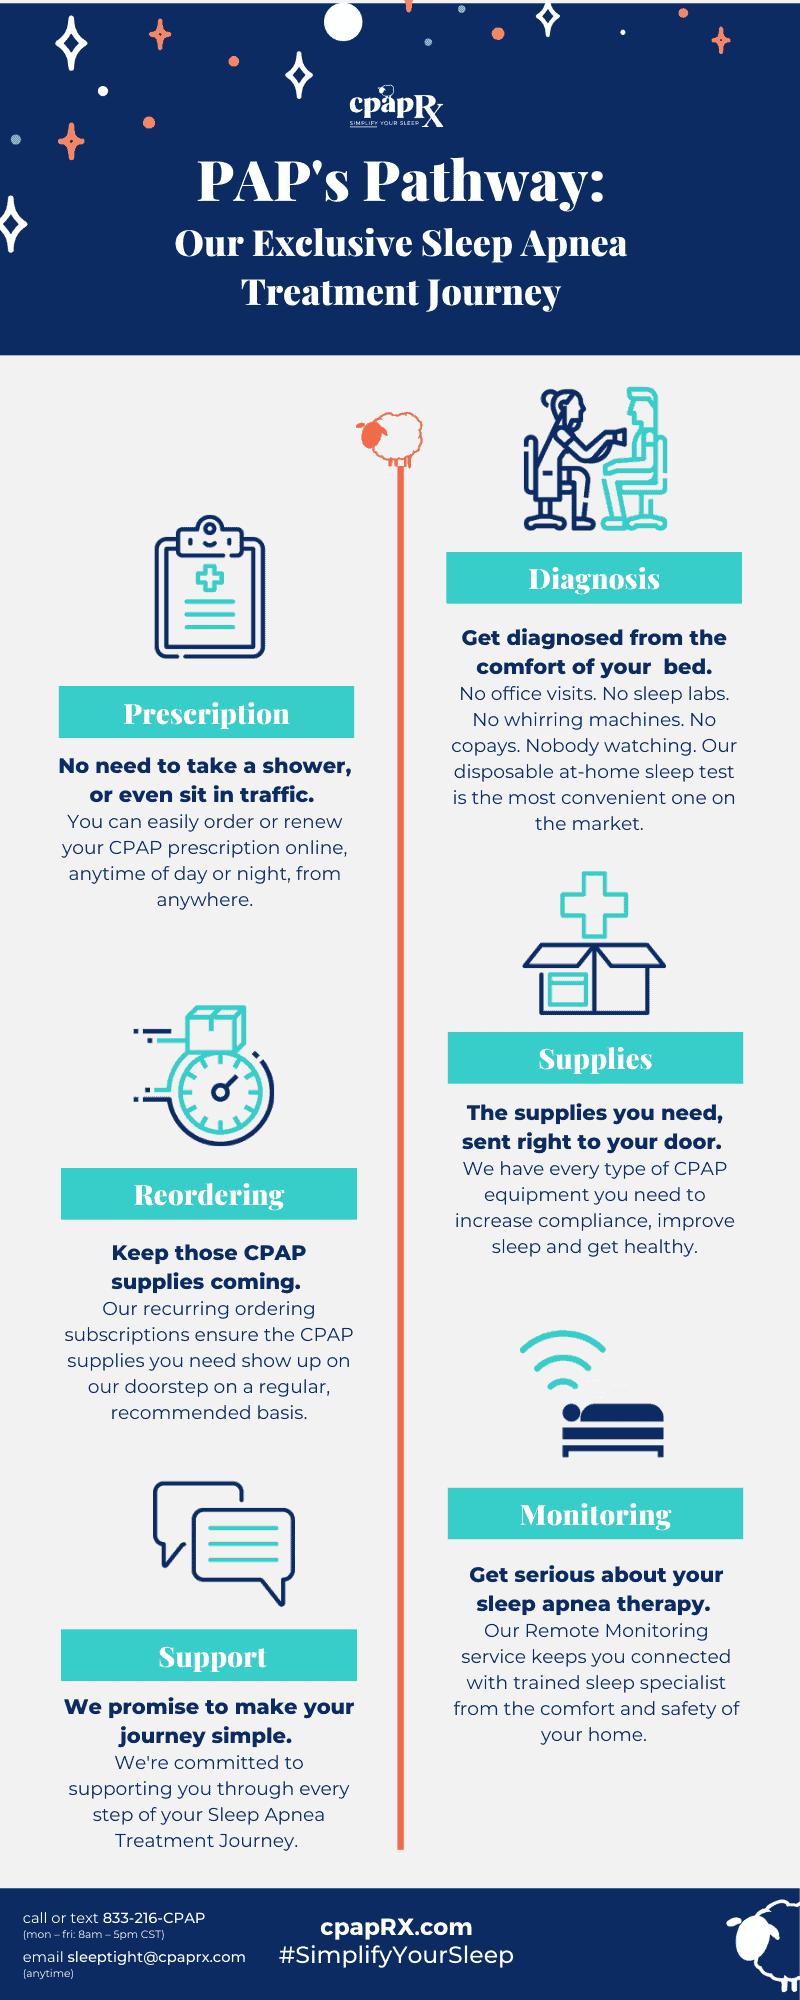 cpapRX Infographic - PAPs Way - Exclusive Sleep Apnea Treatment Journey